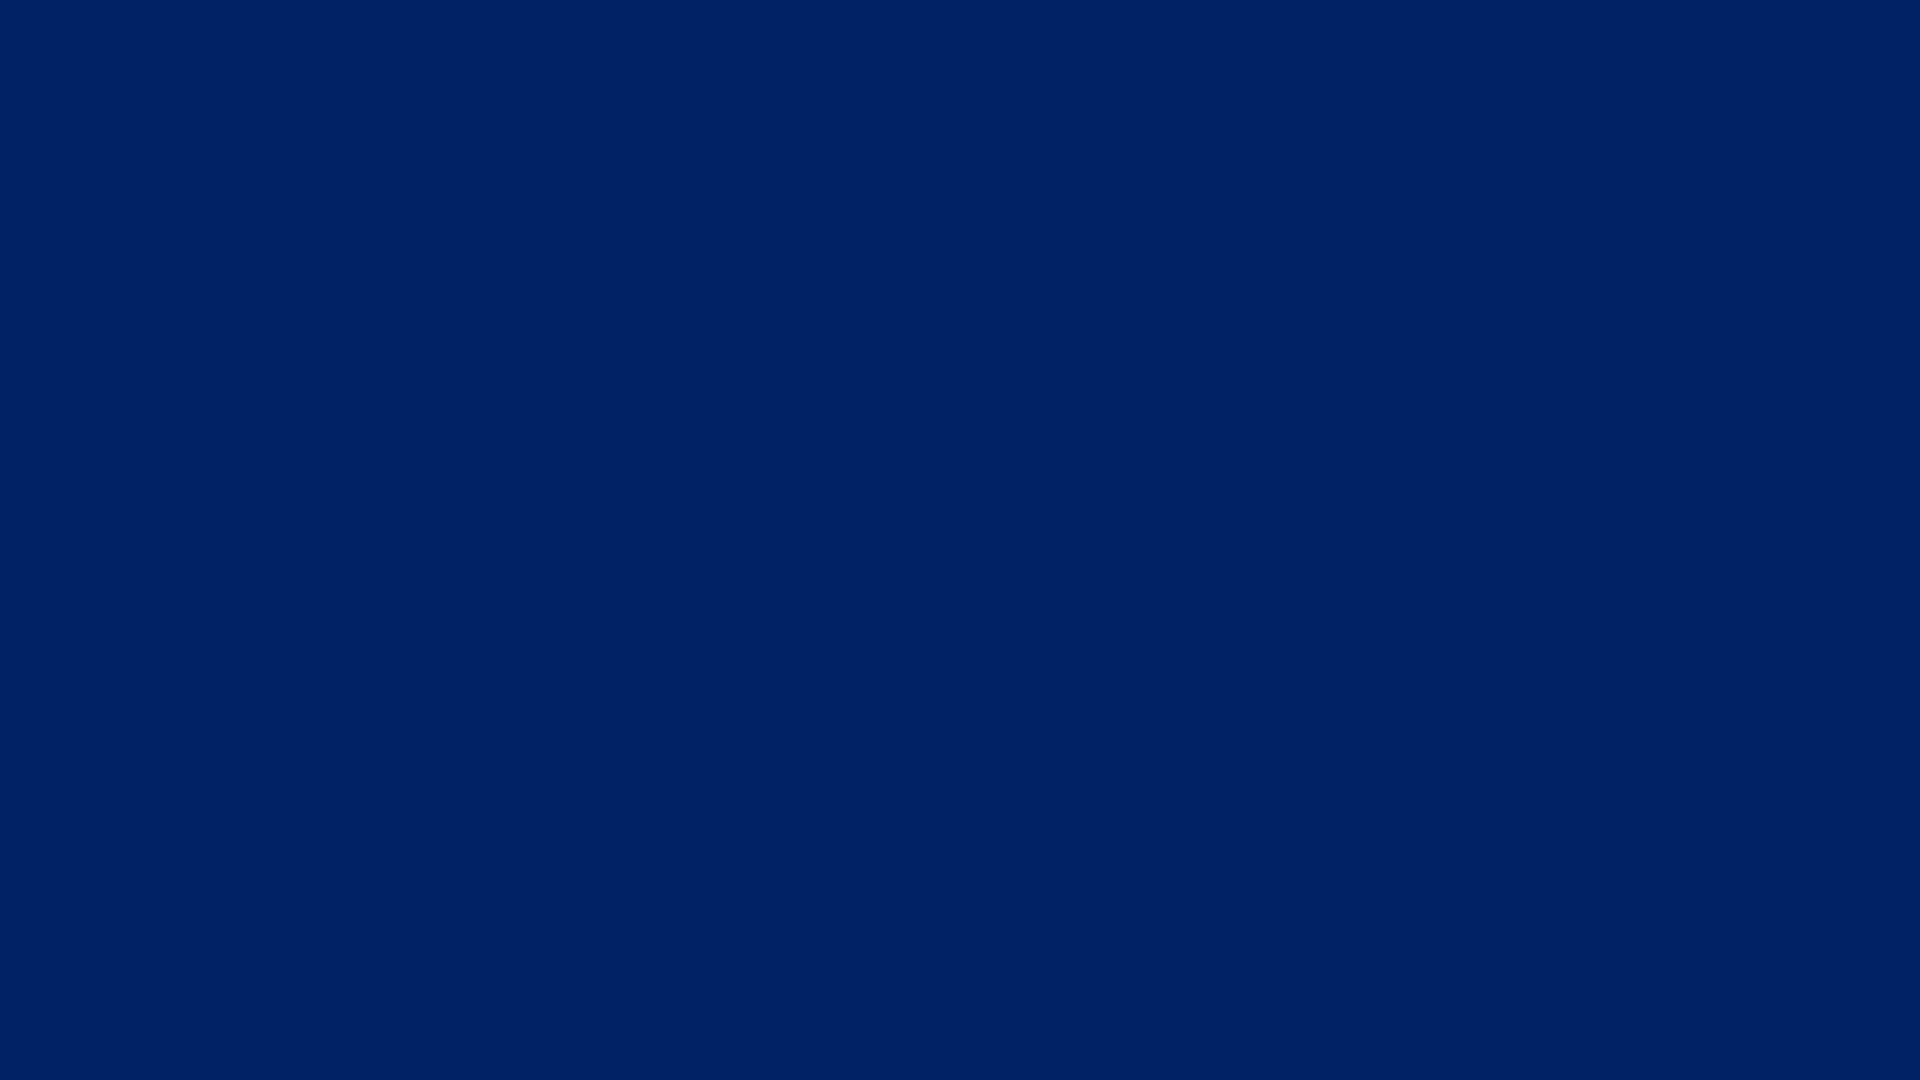 Plain Blue Desktop wallpaper